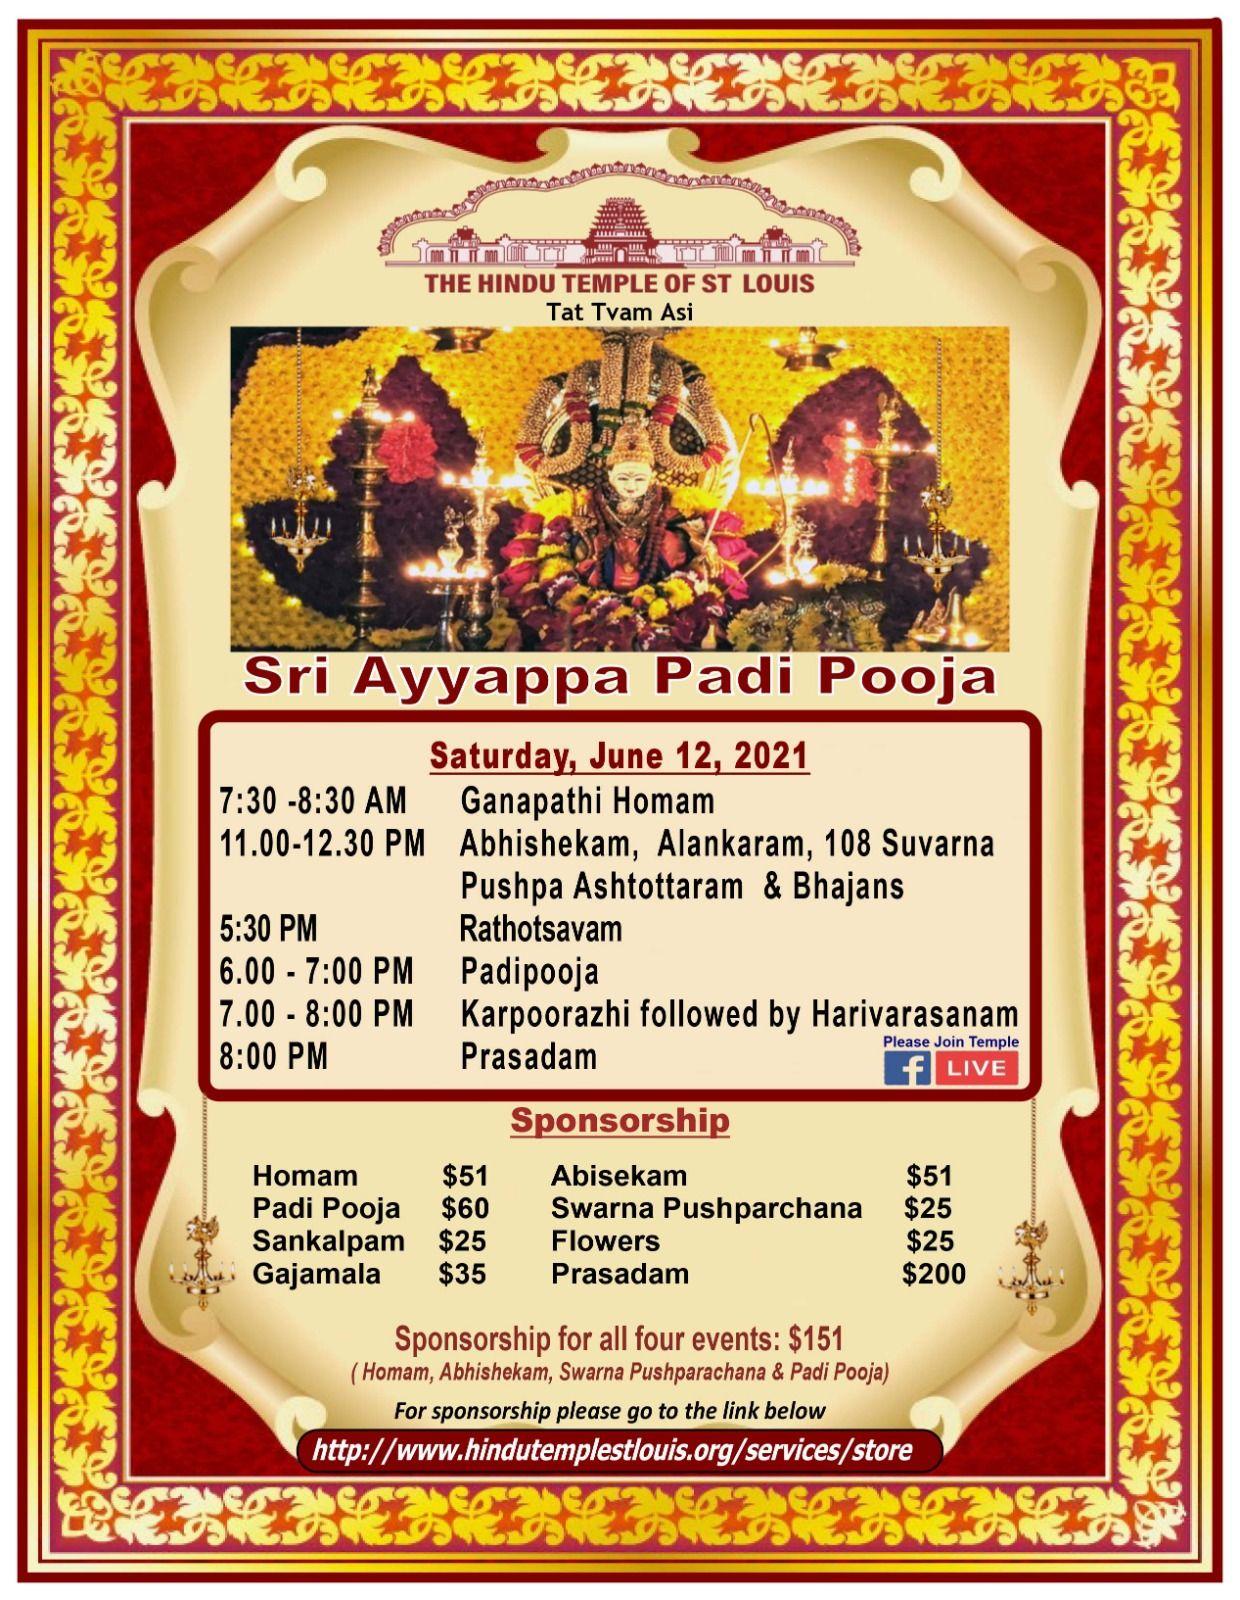 Sri Ayyappa Padi Pooja